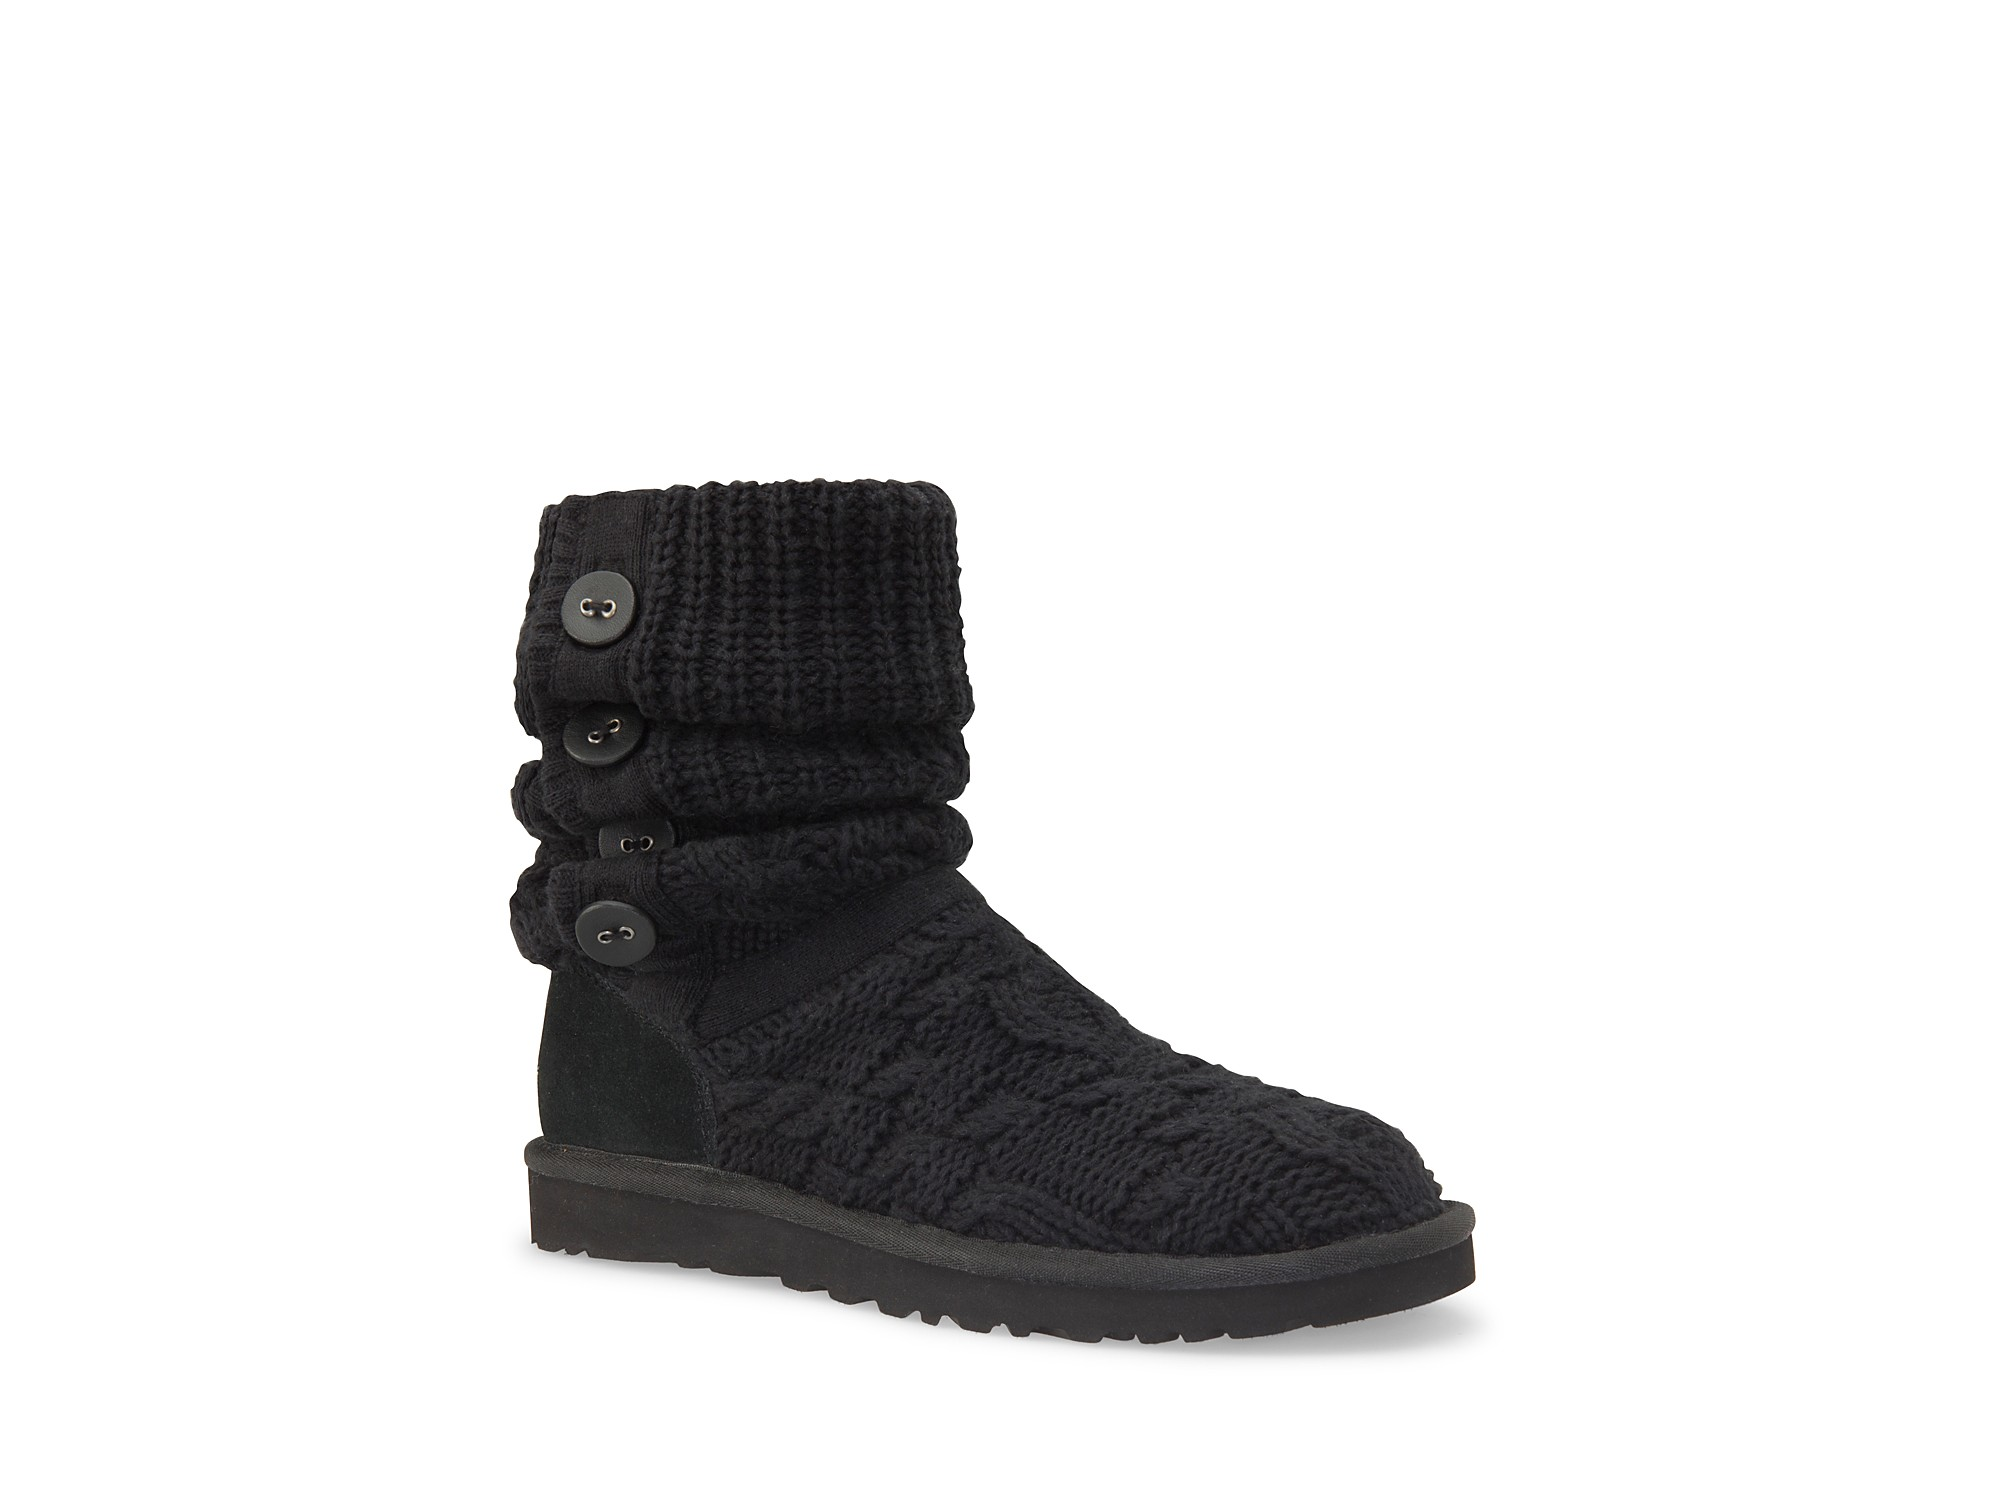 ugg boots leland knit foldover in black lyst